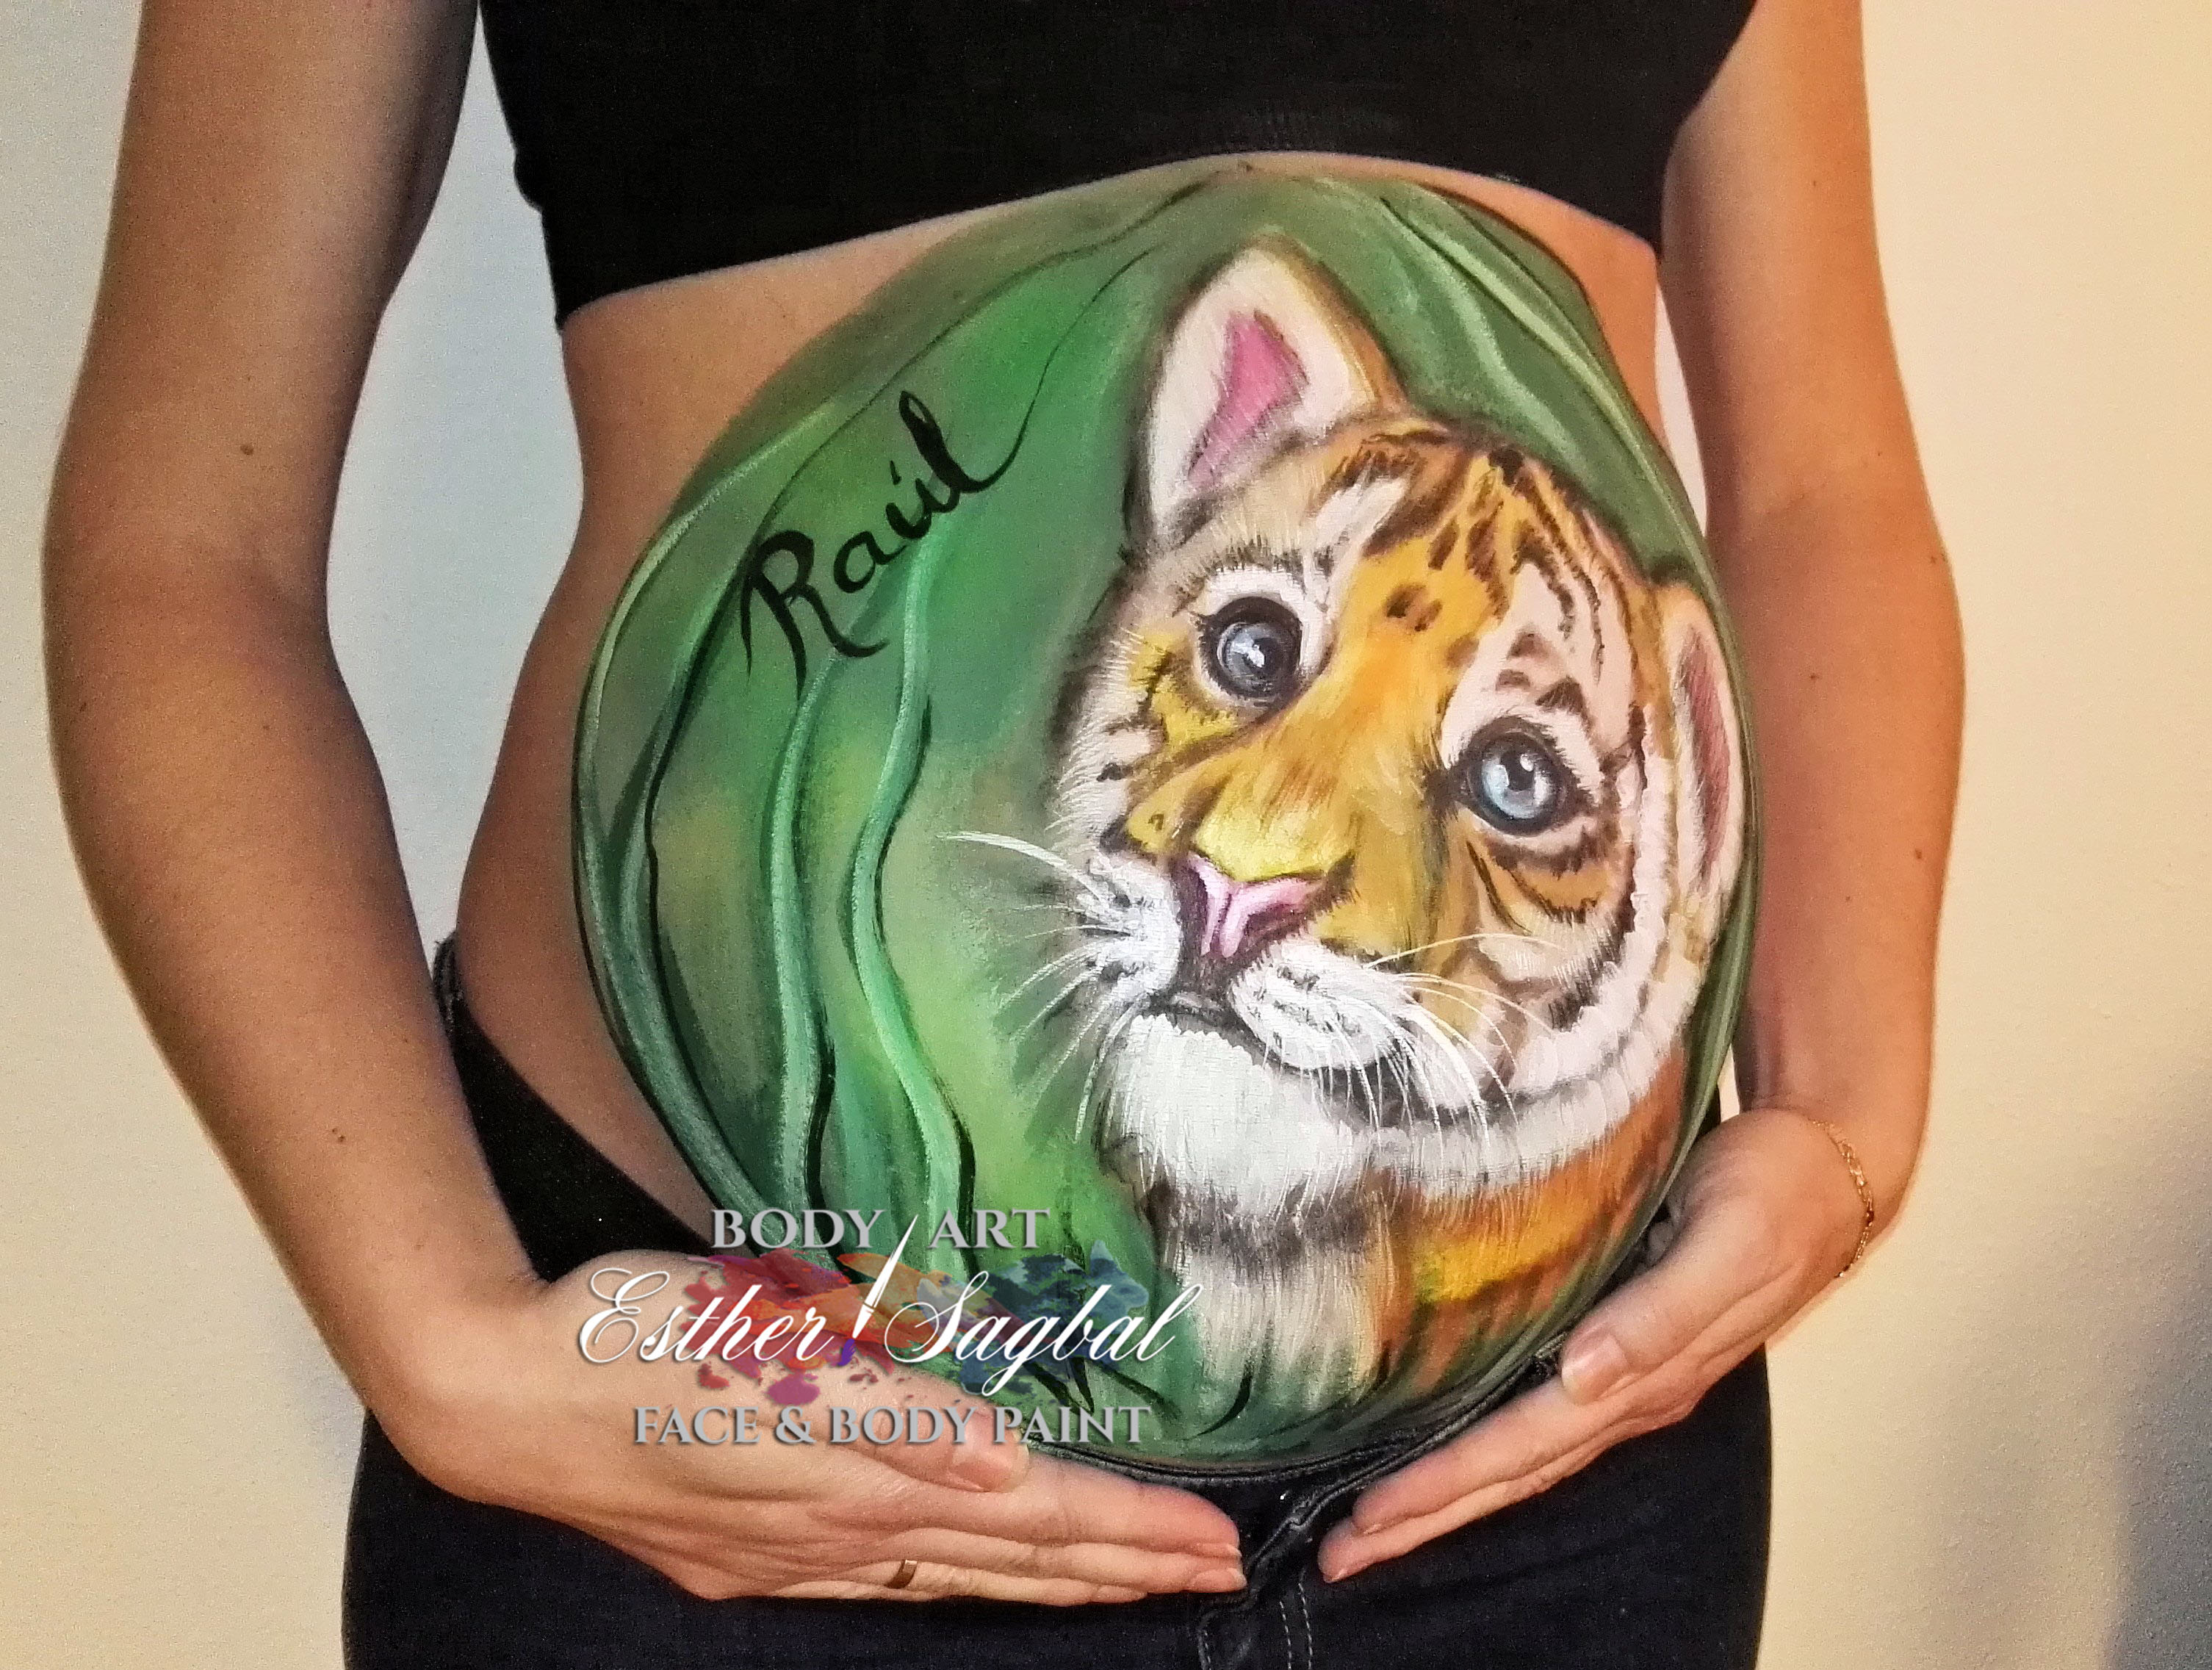 bodypaint embarazo